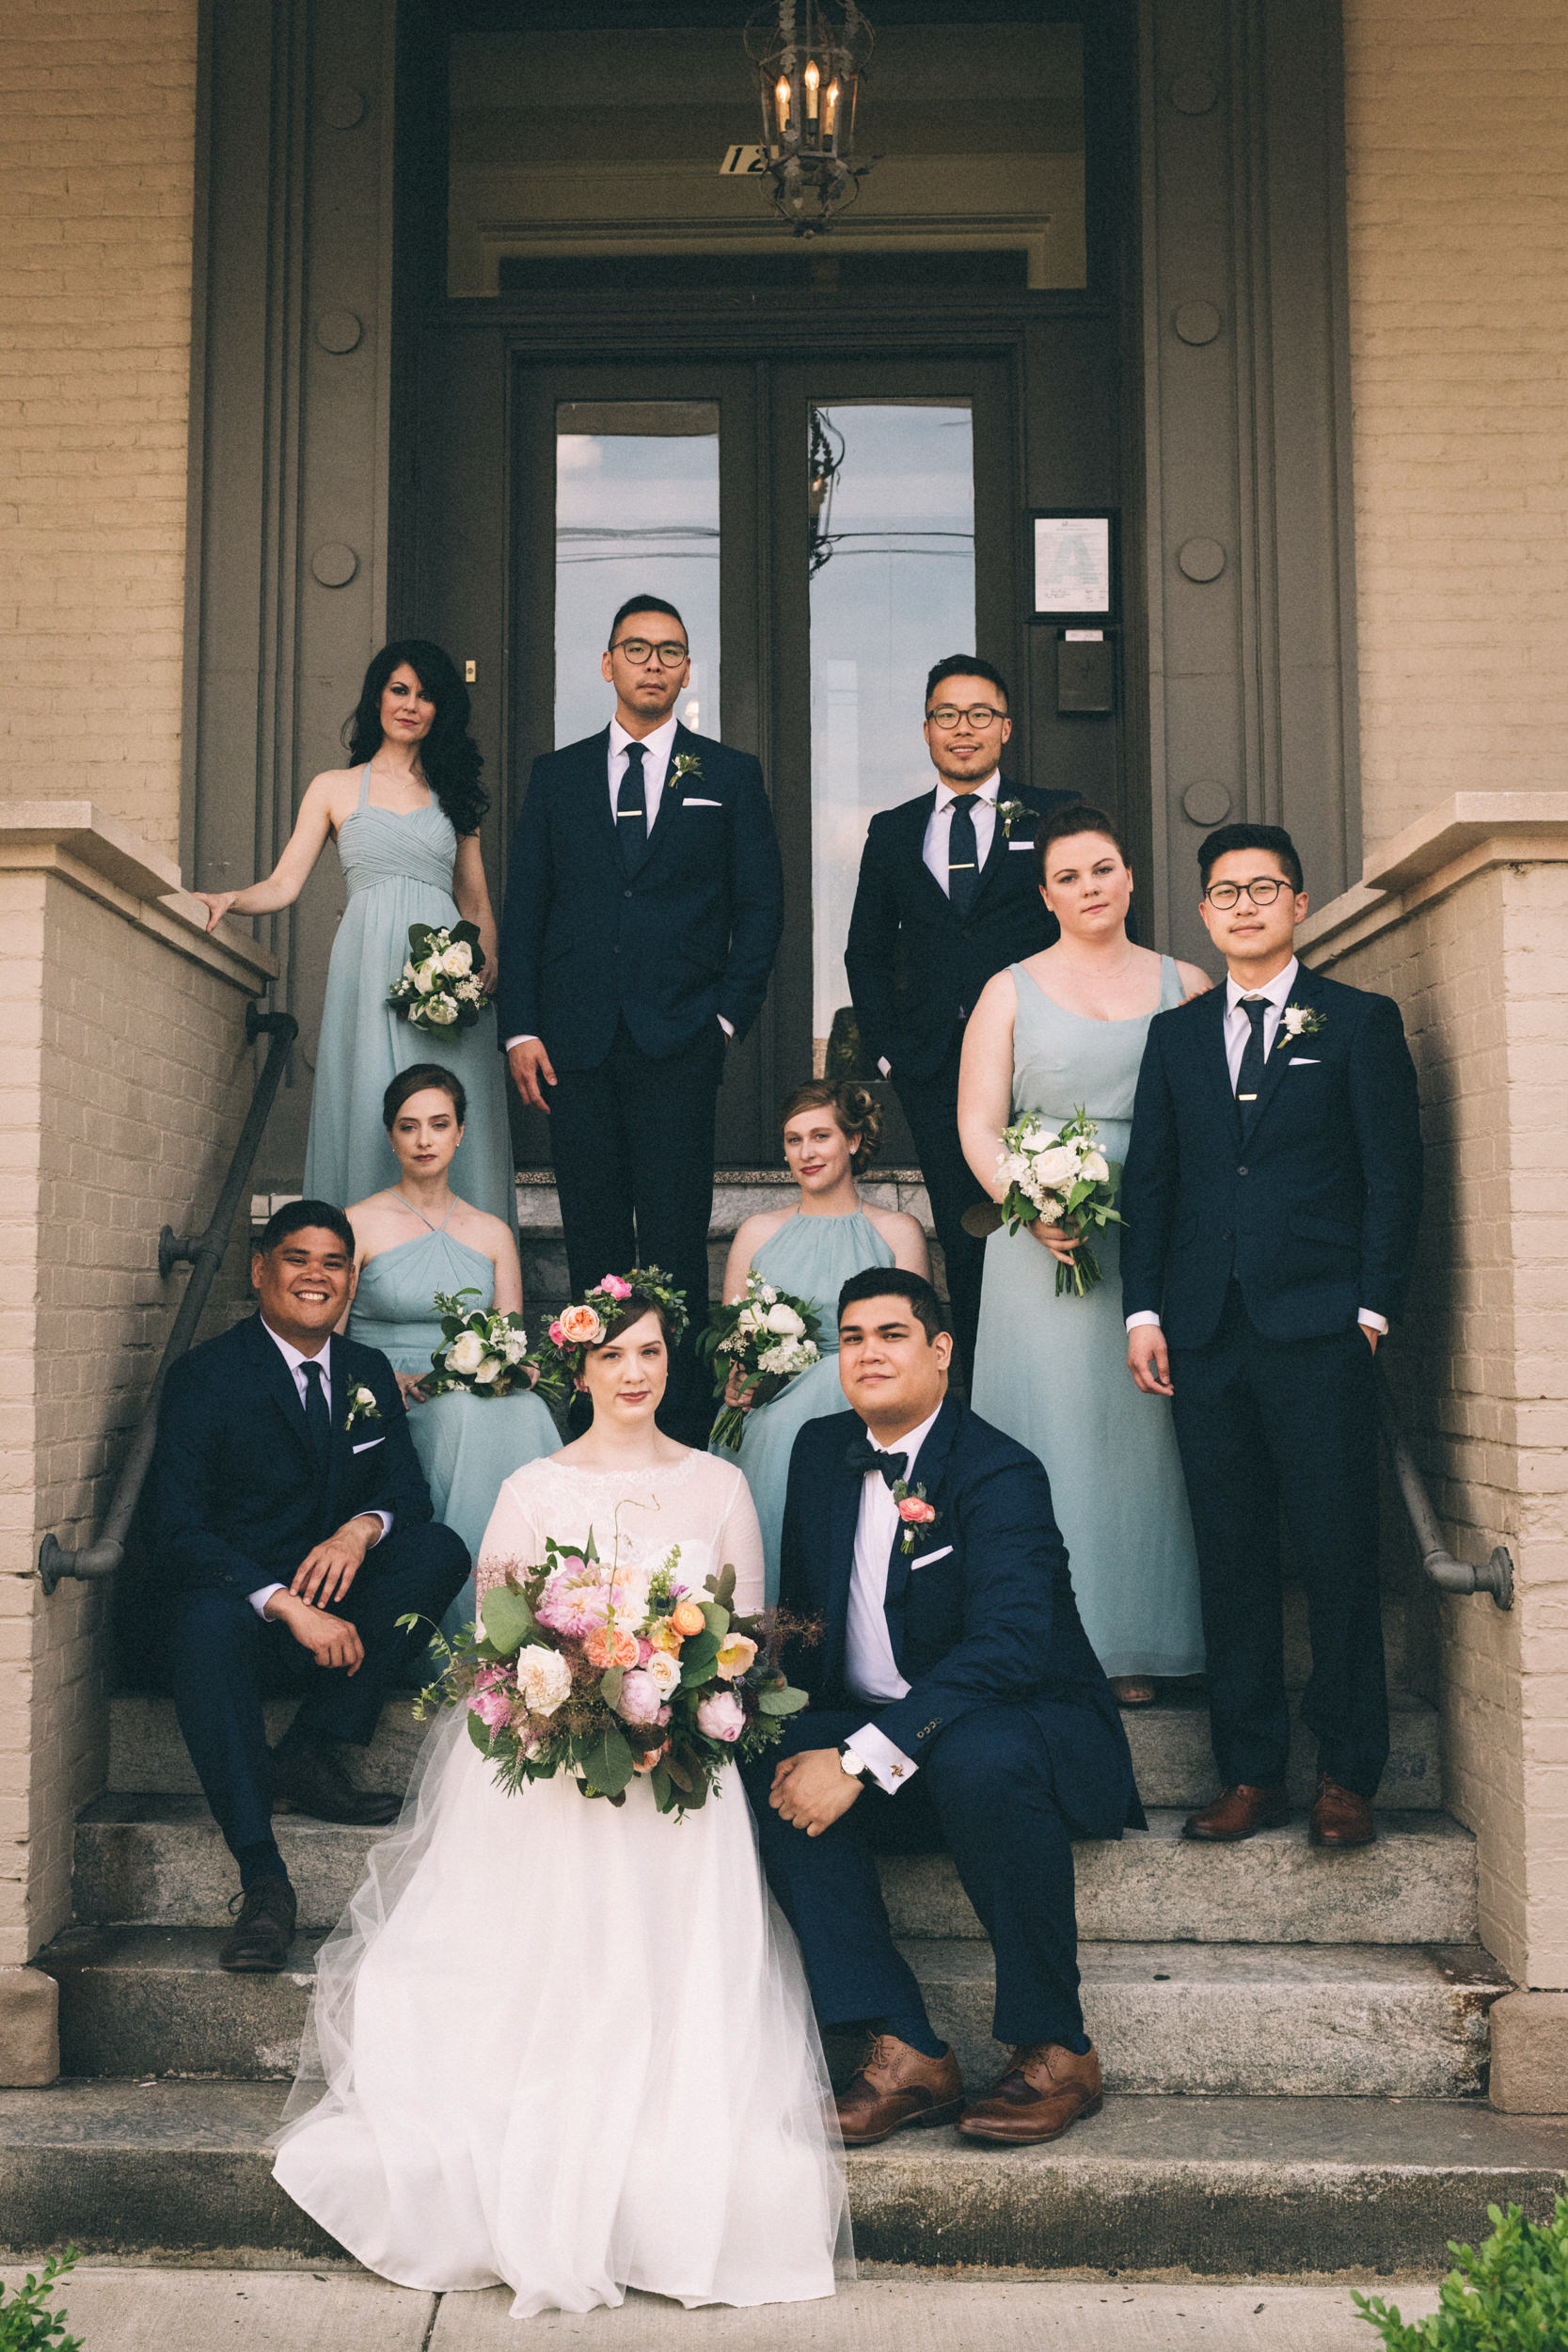 lauren-dean-wedding-grand-lodge-kentucky-sarah-katherine-davis-photography-183edit.jpg